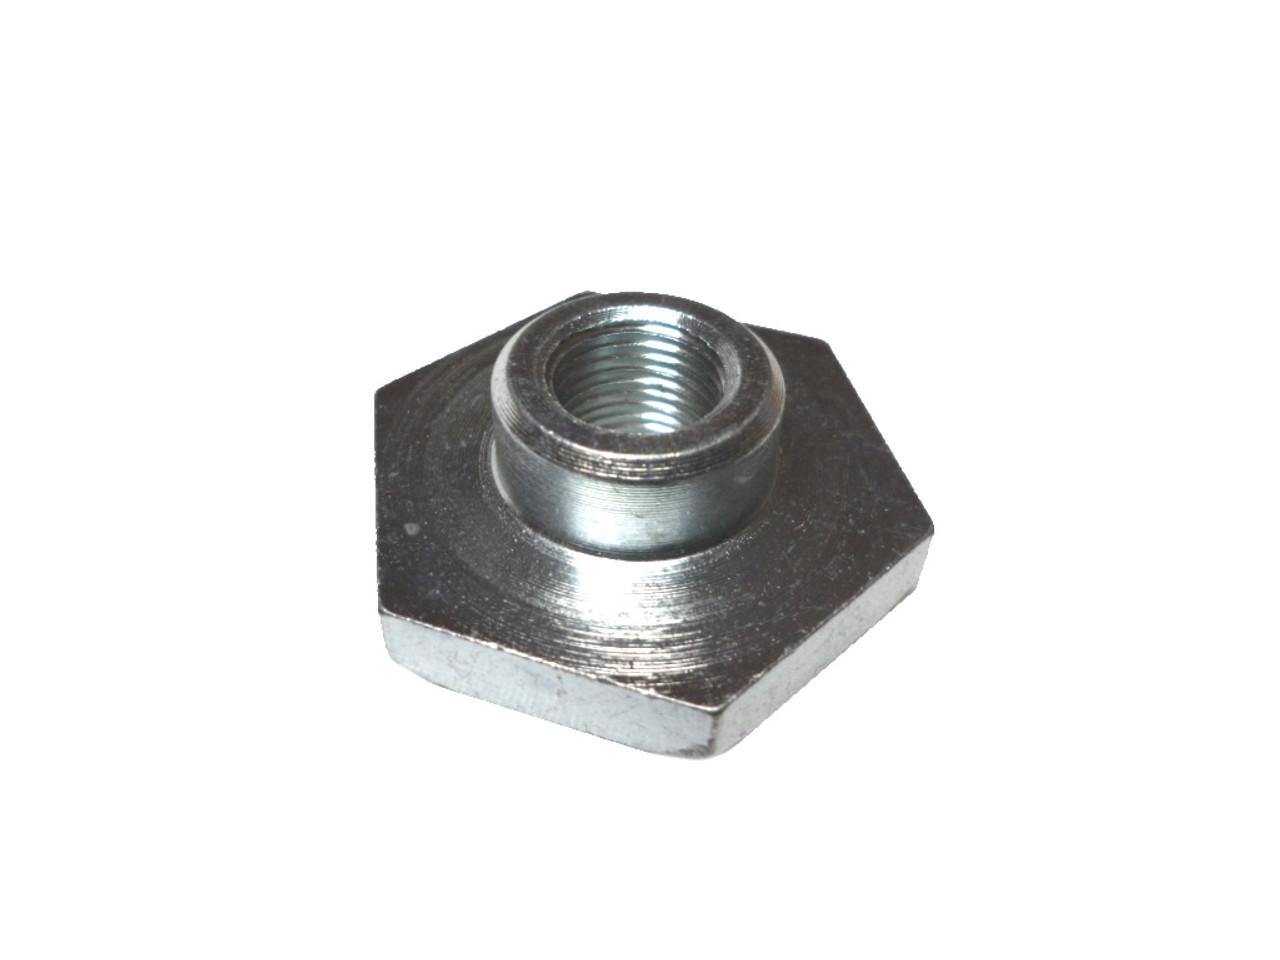 Motobecane Flywheel Nut, Regular Threading - 11mm x 1mm